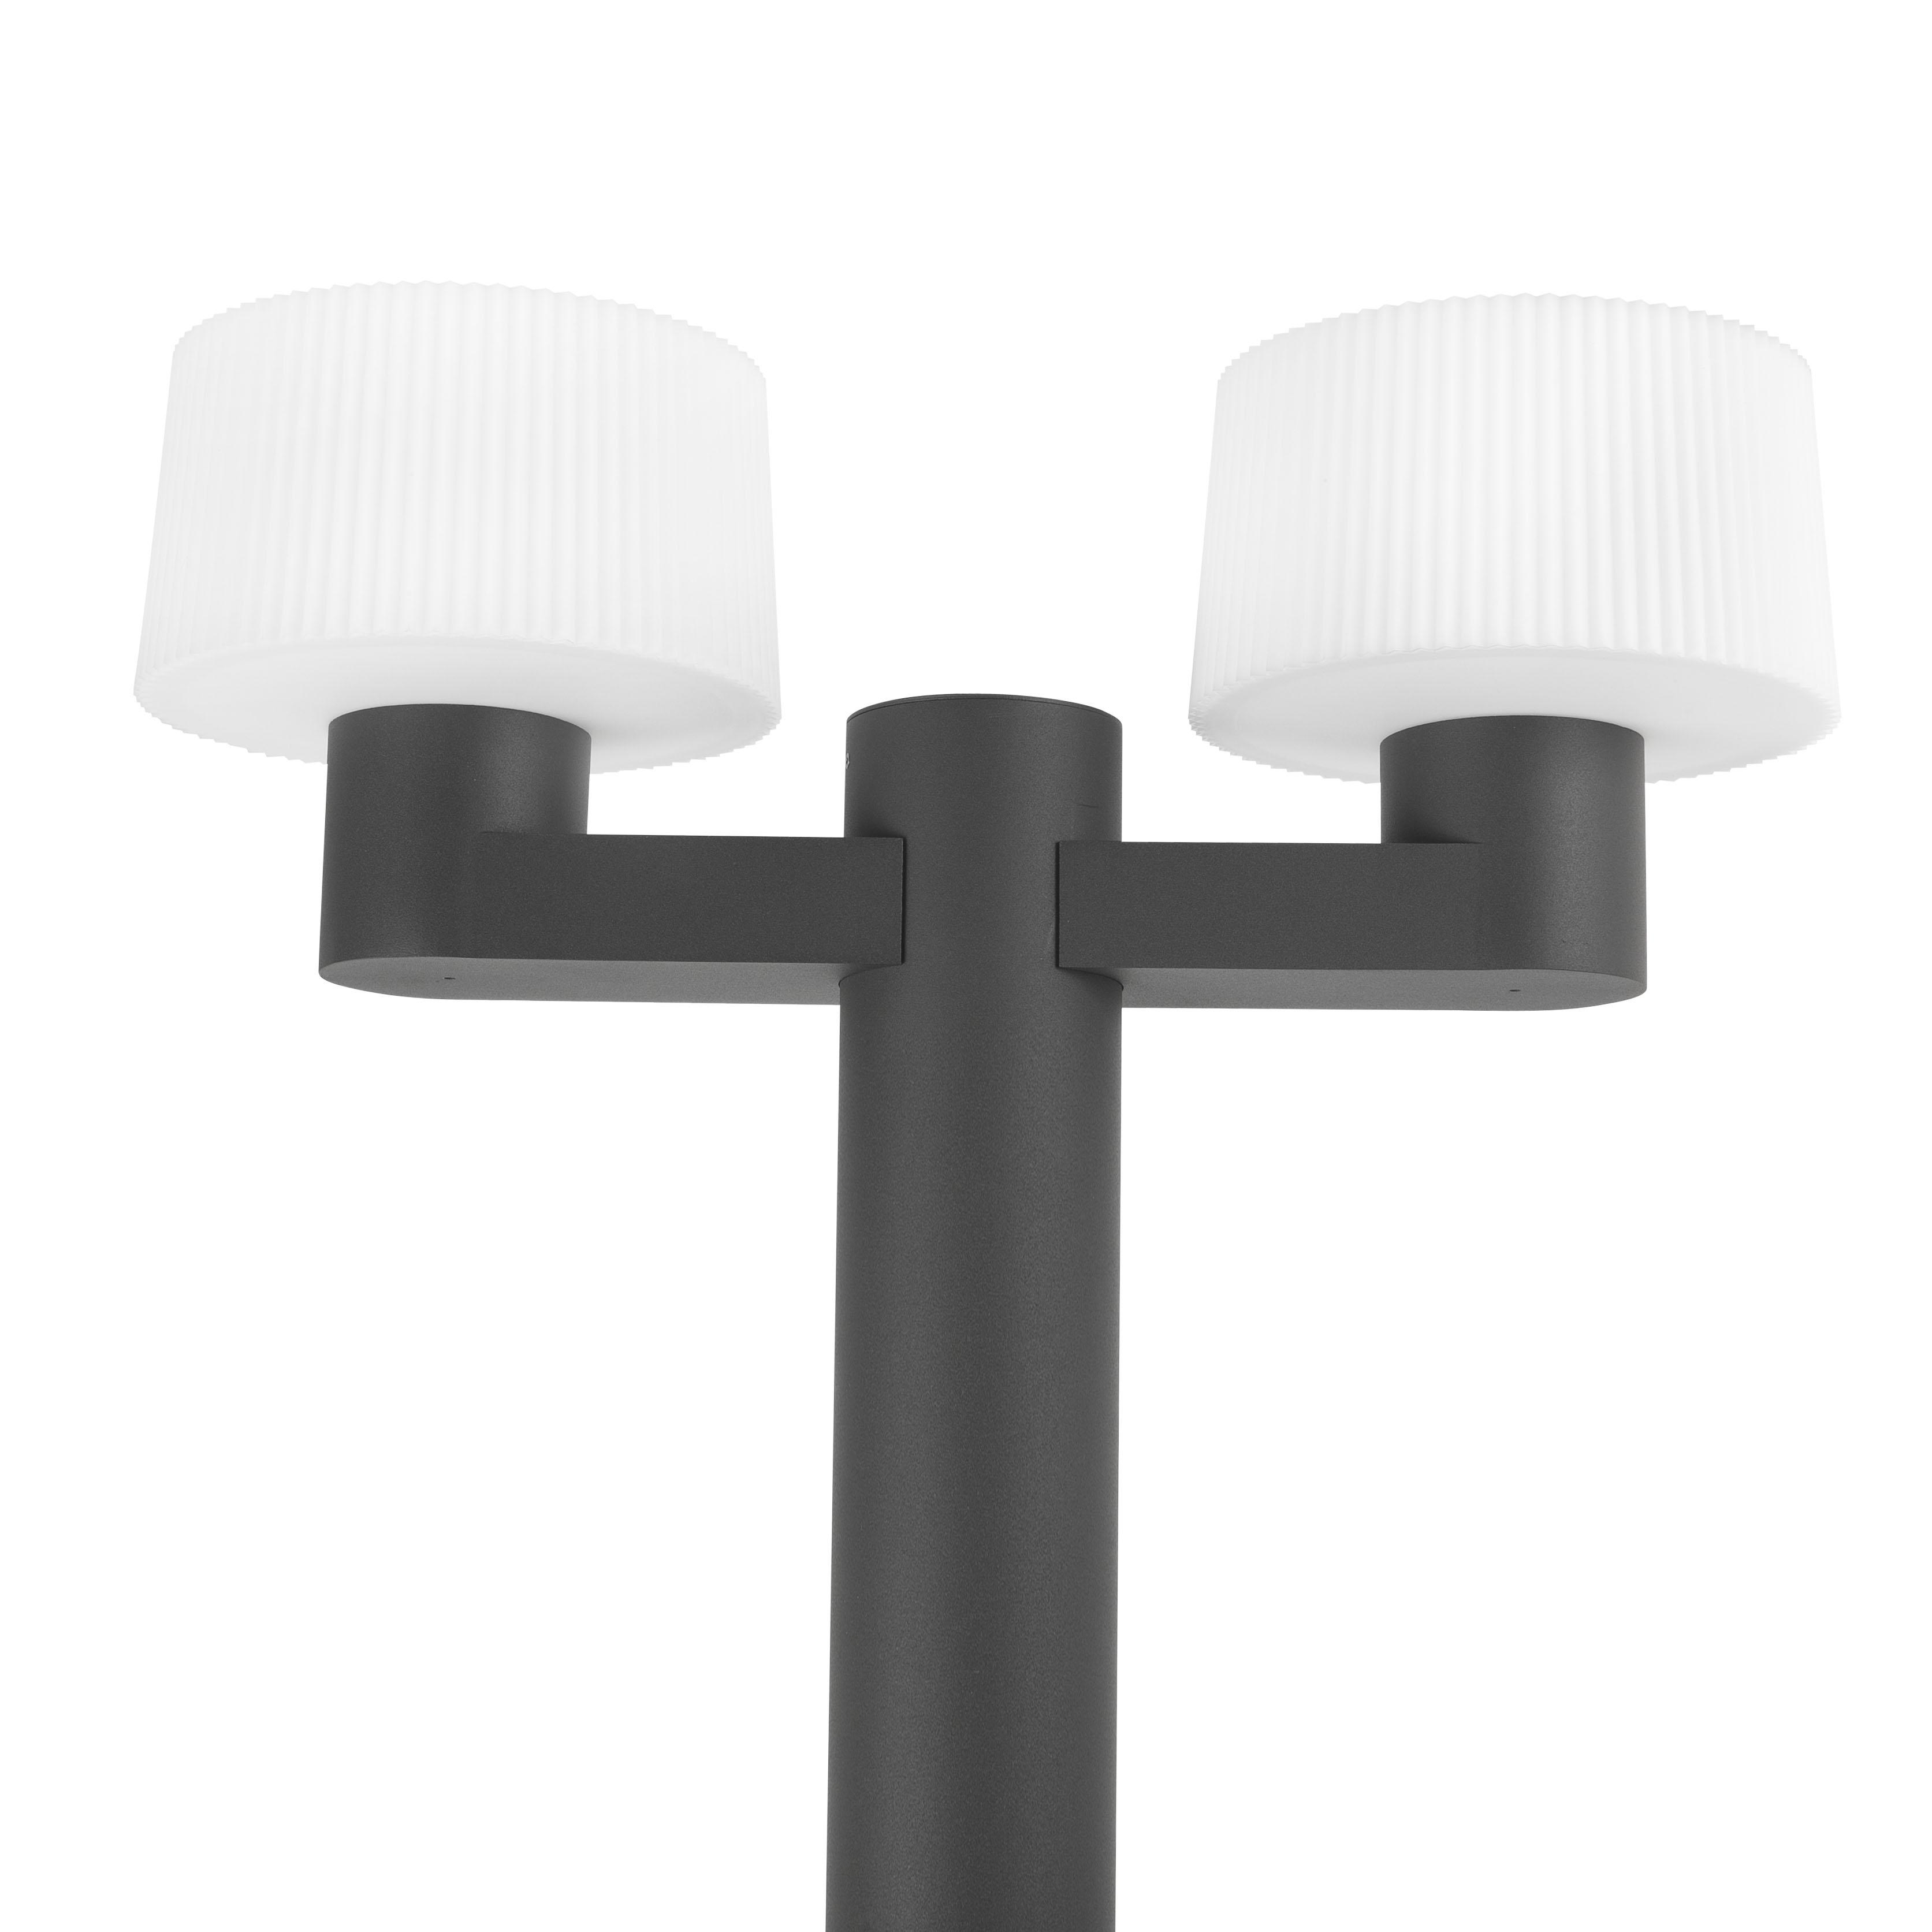 Lantaarnpaal met 2 Muffin lampen aluminium 74435-74429 ESR